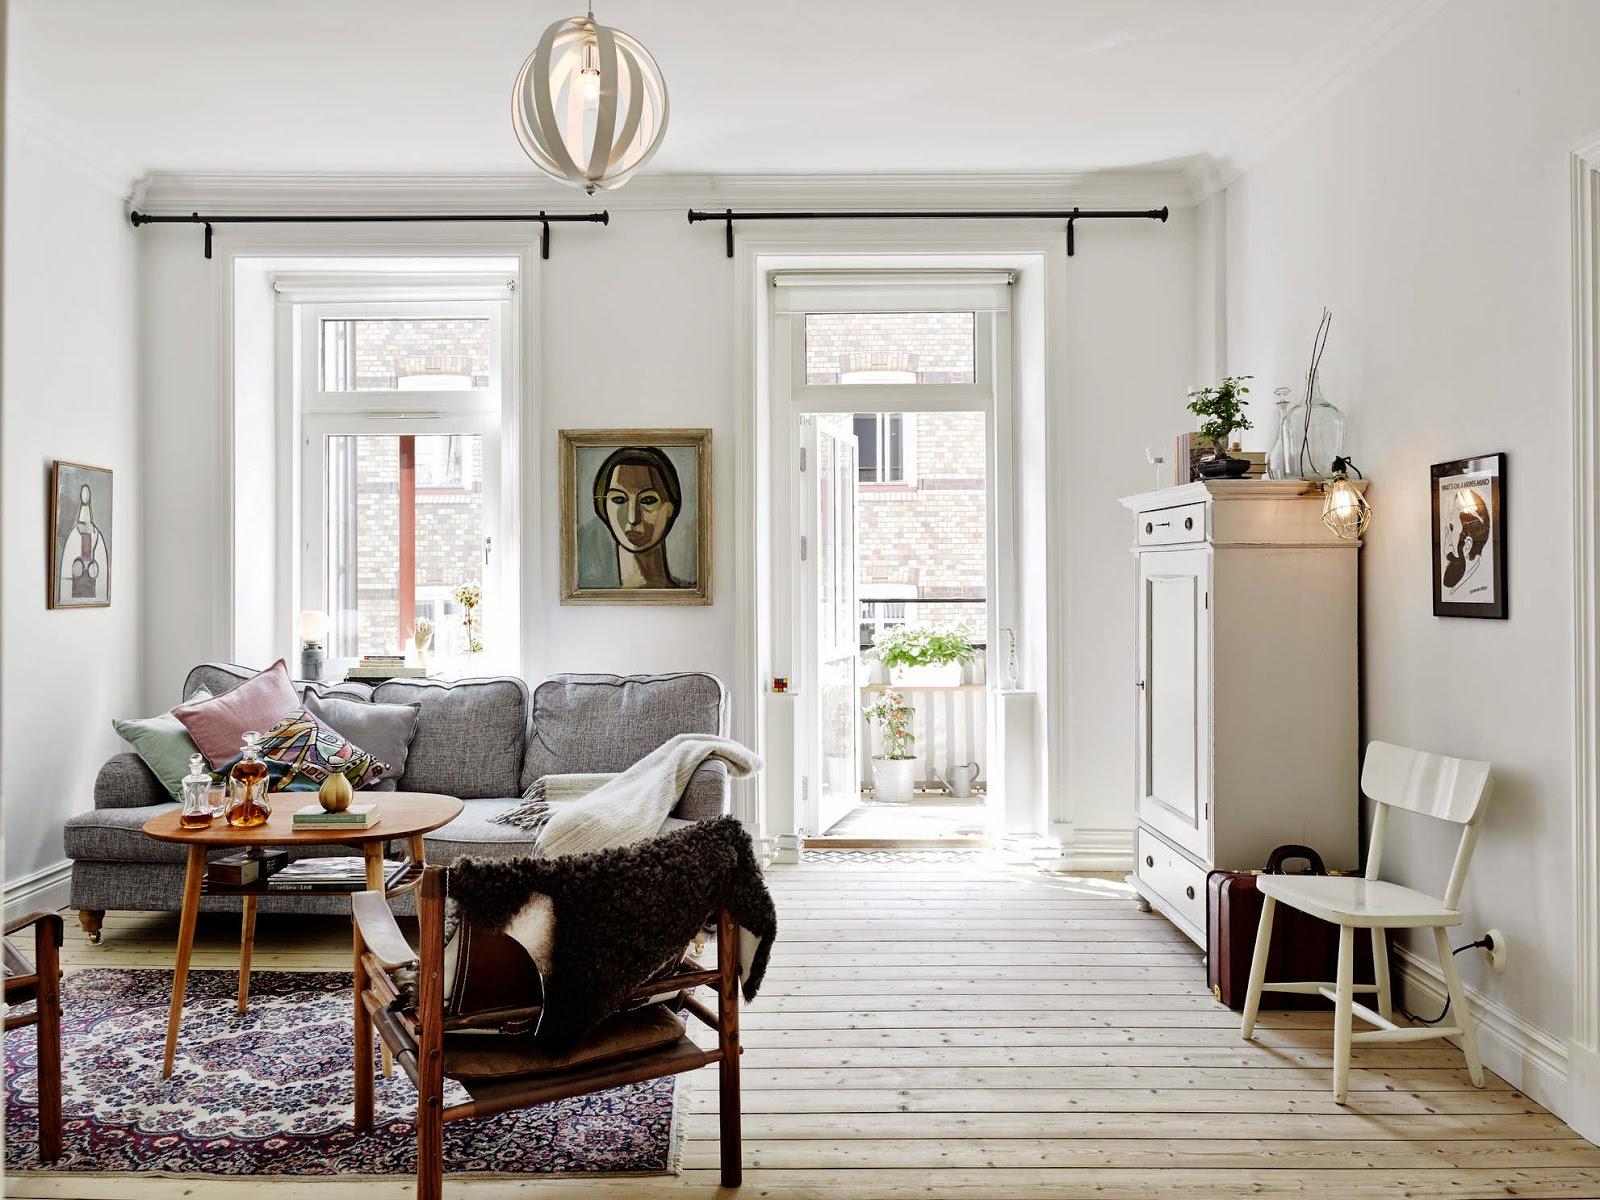 Scandinavian Home Fjeldborg Blog: My Scandinavian Home: A Lovely Gothenburg Apartment With